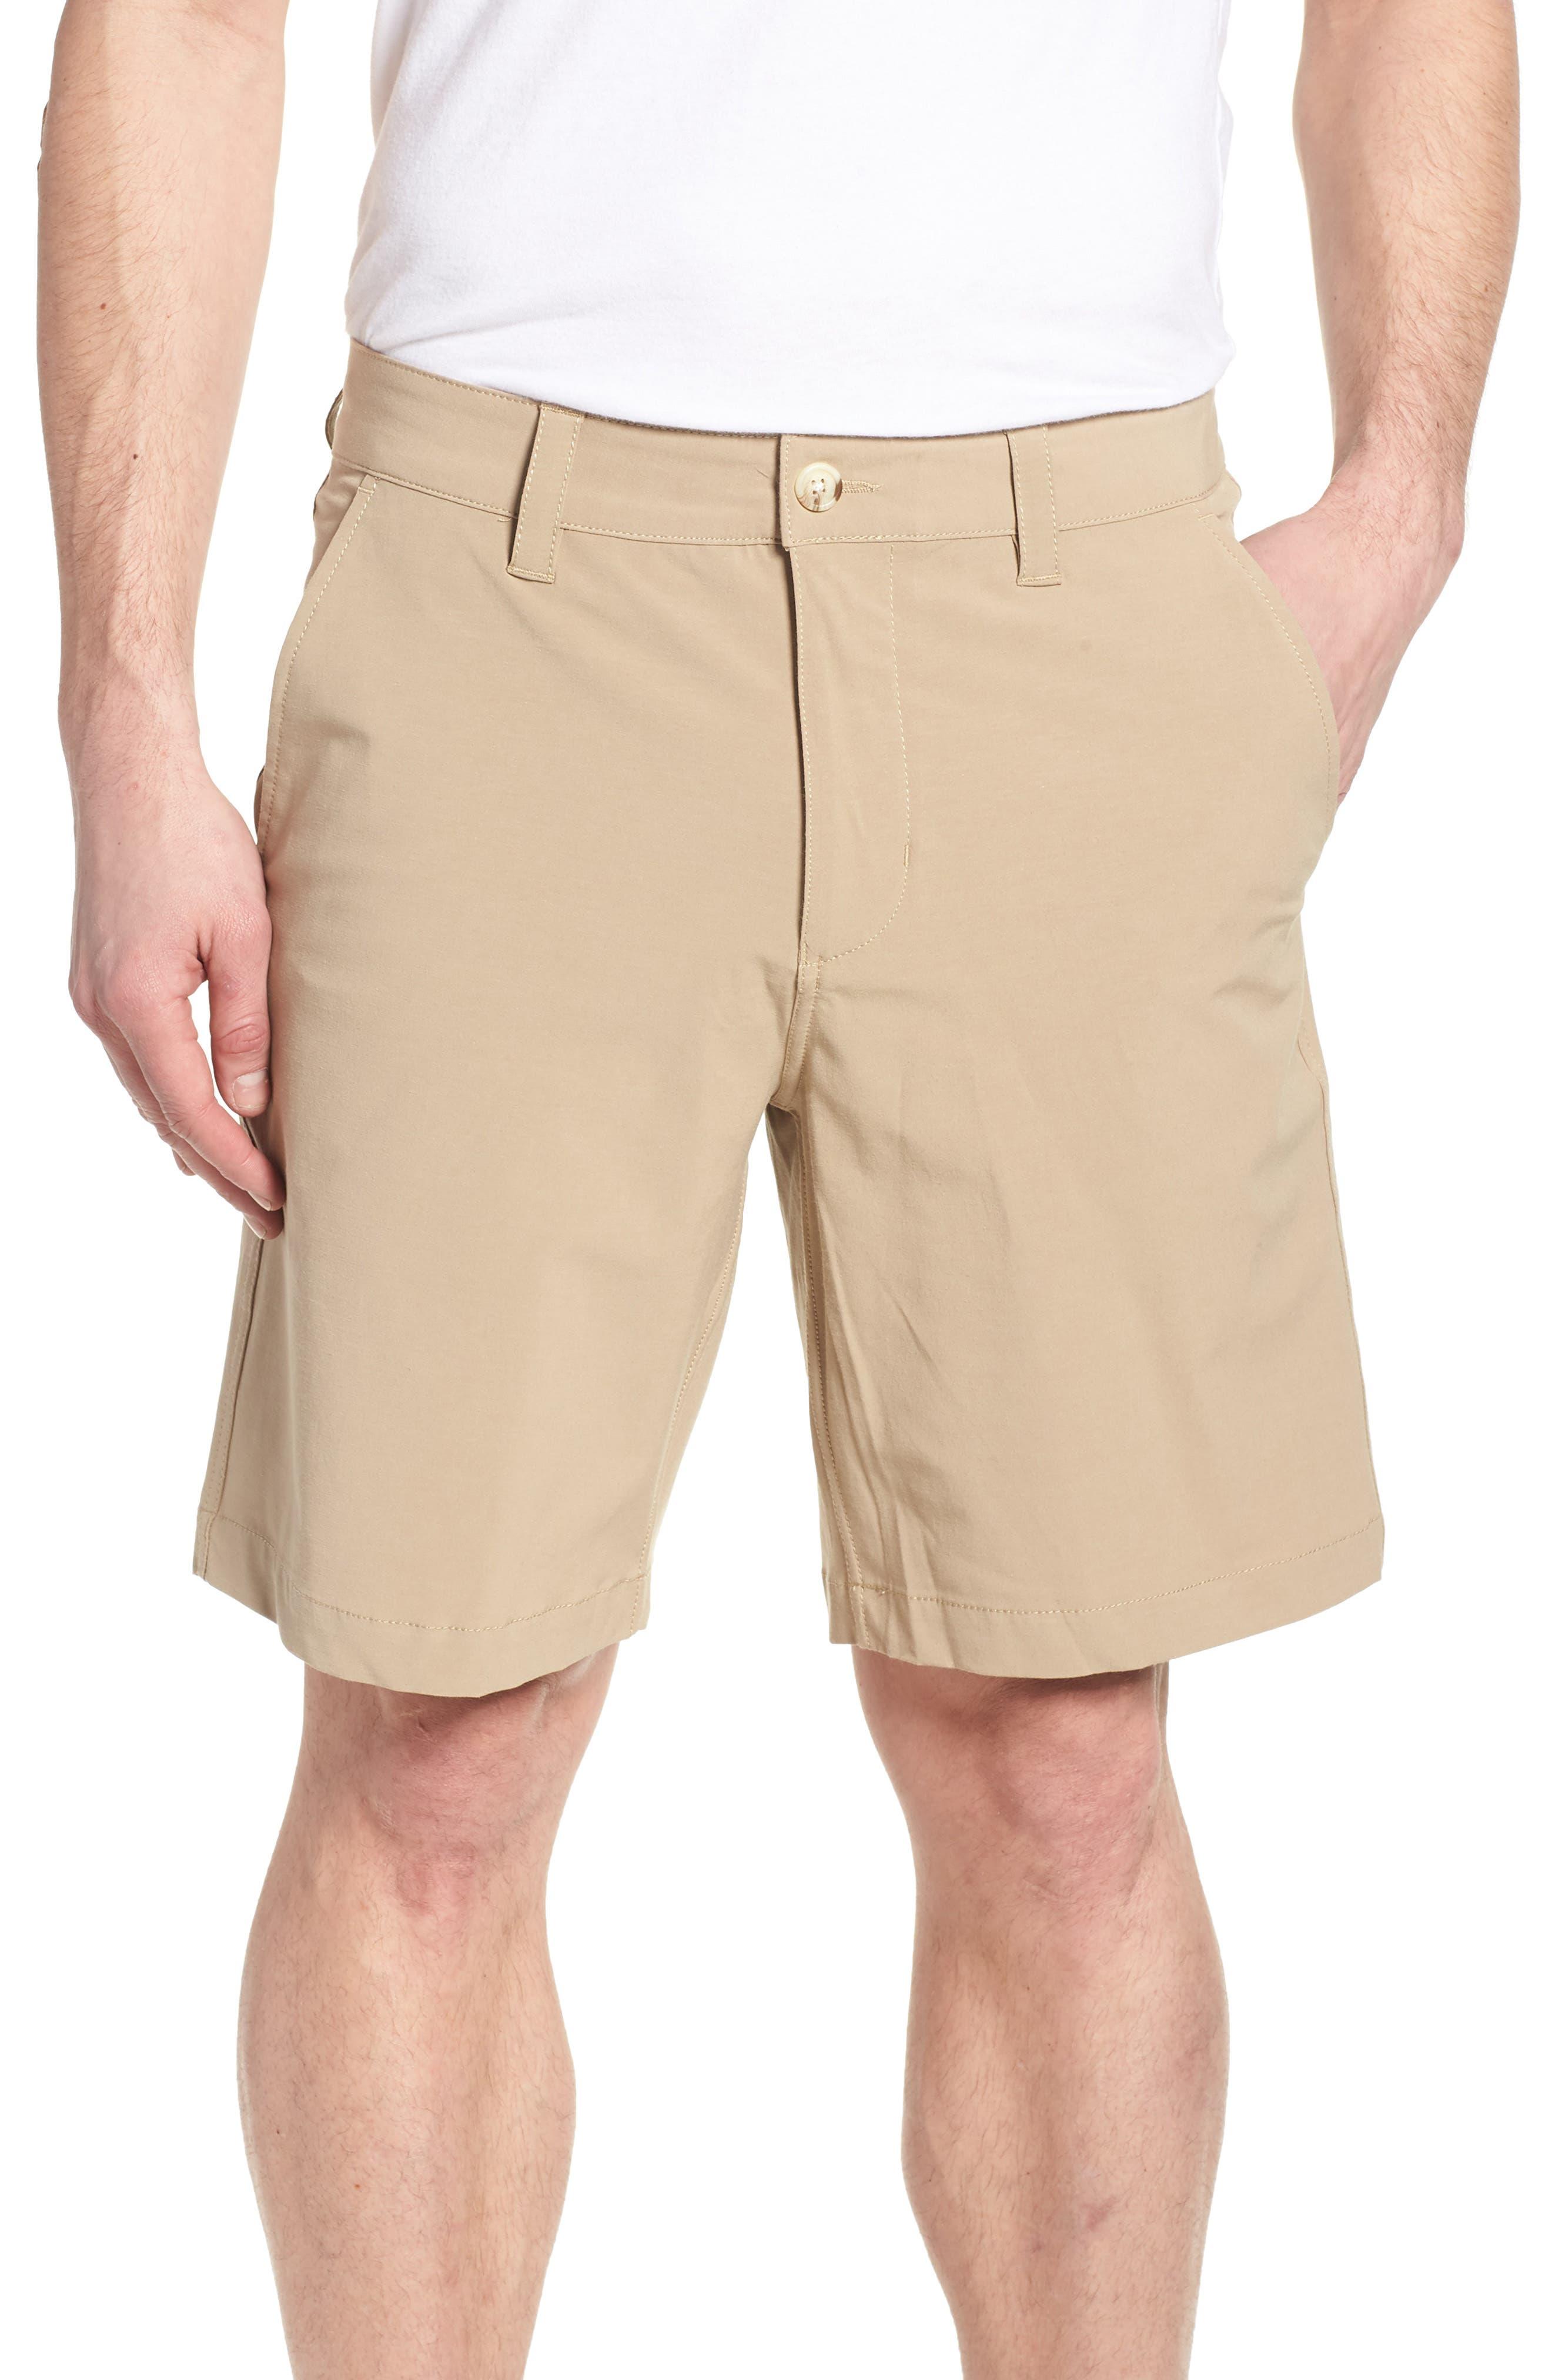 T3 Gulf Shorts,                         Main,                         color, Sandstone Khaki